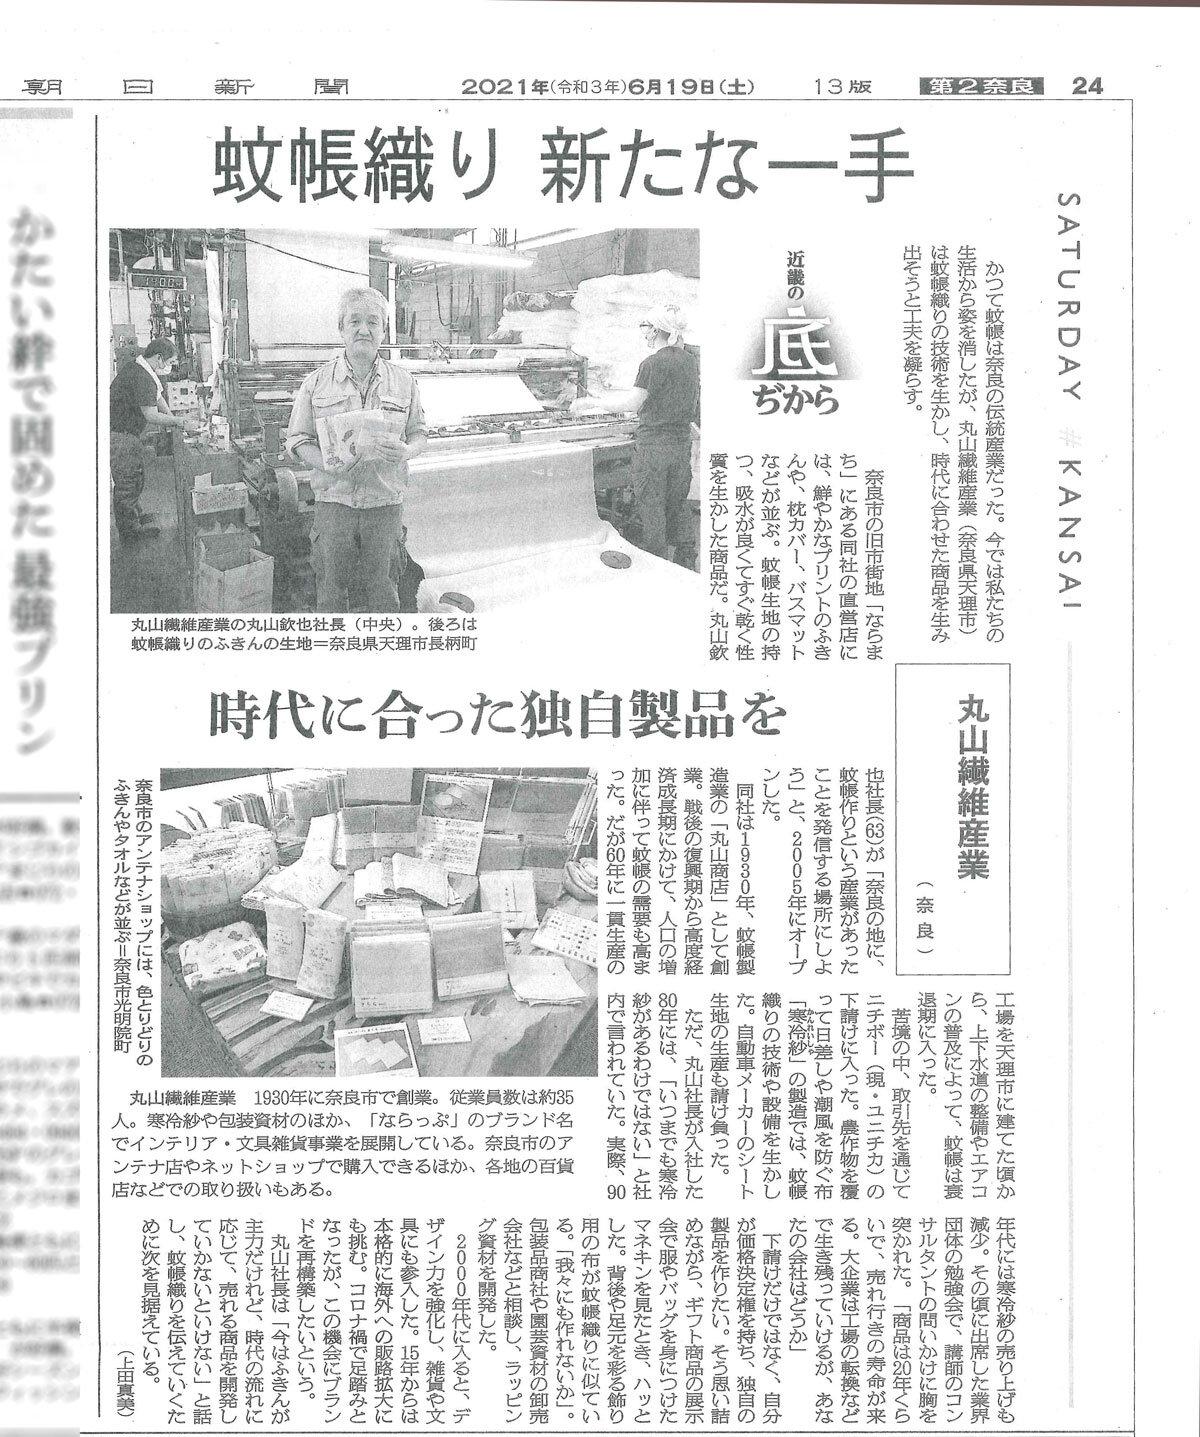 https://www.maruyama-seni.co.jp/information/asahi20210519.jpg